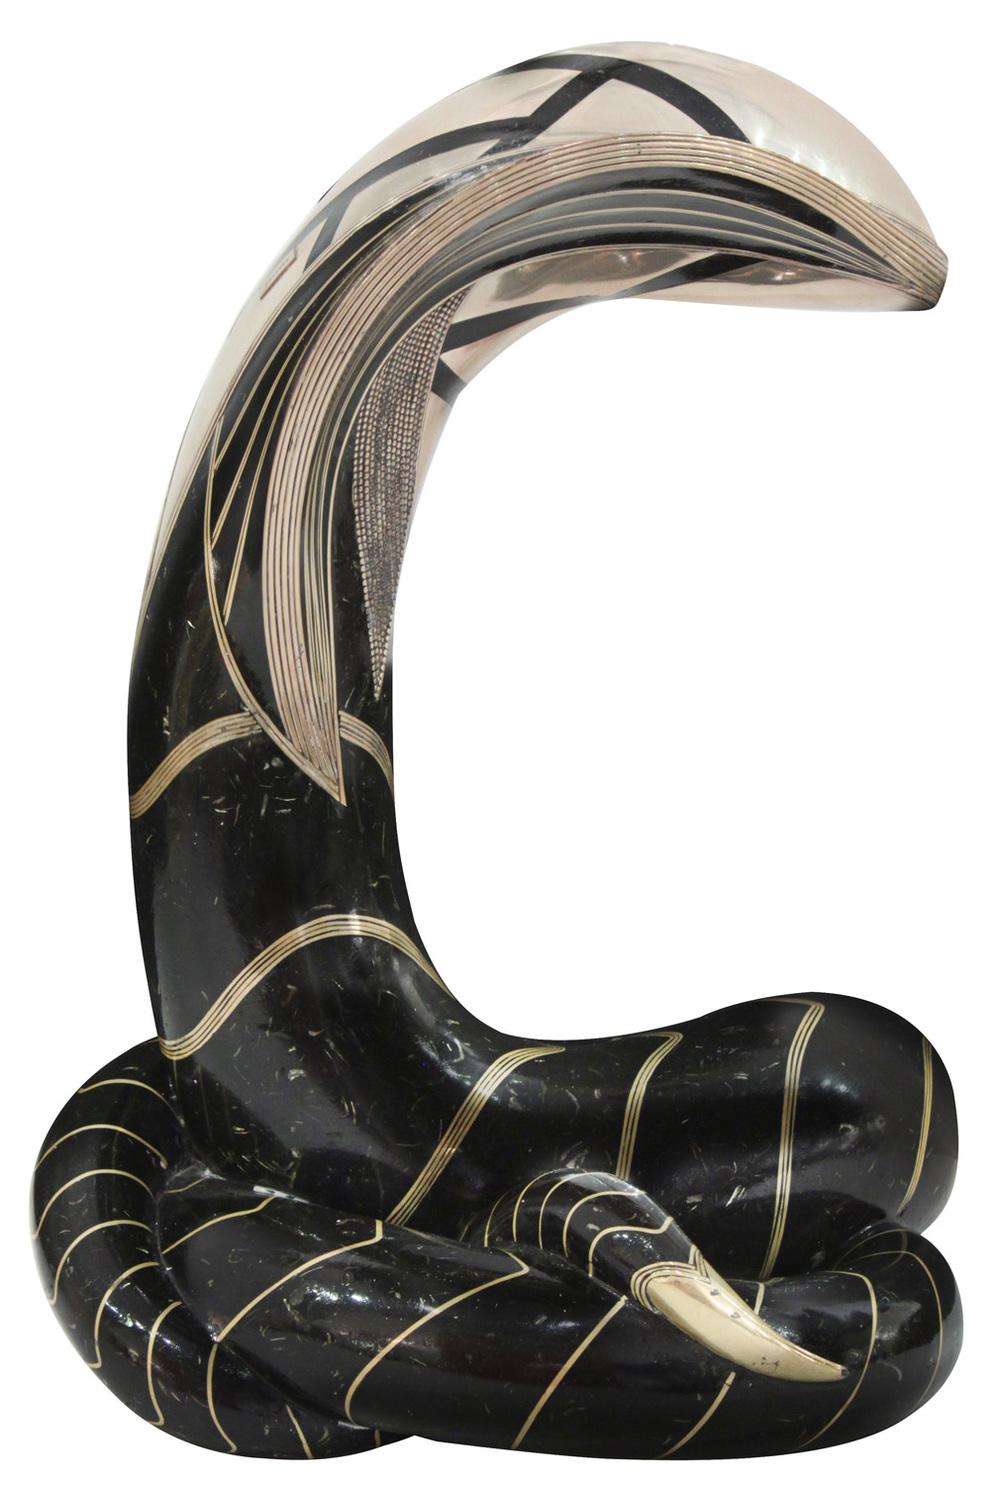 Estevesz 250 Cobra bronze+silver sculpture95 detail2 hires.jpg